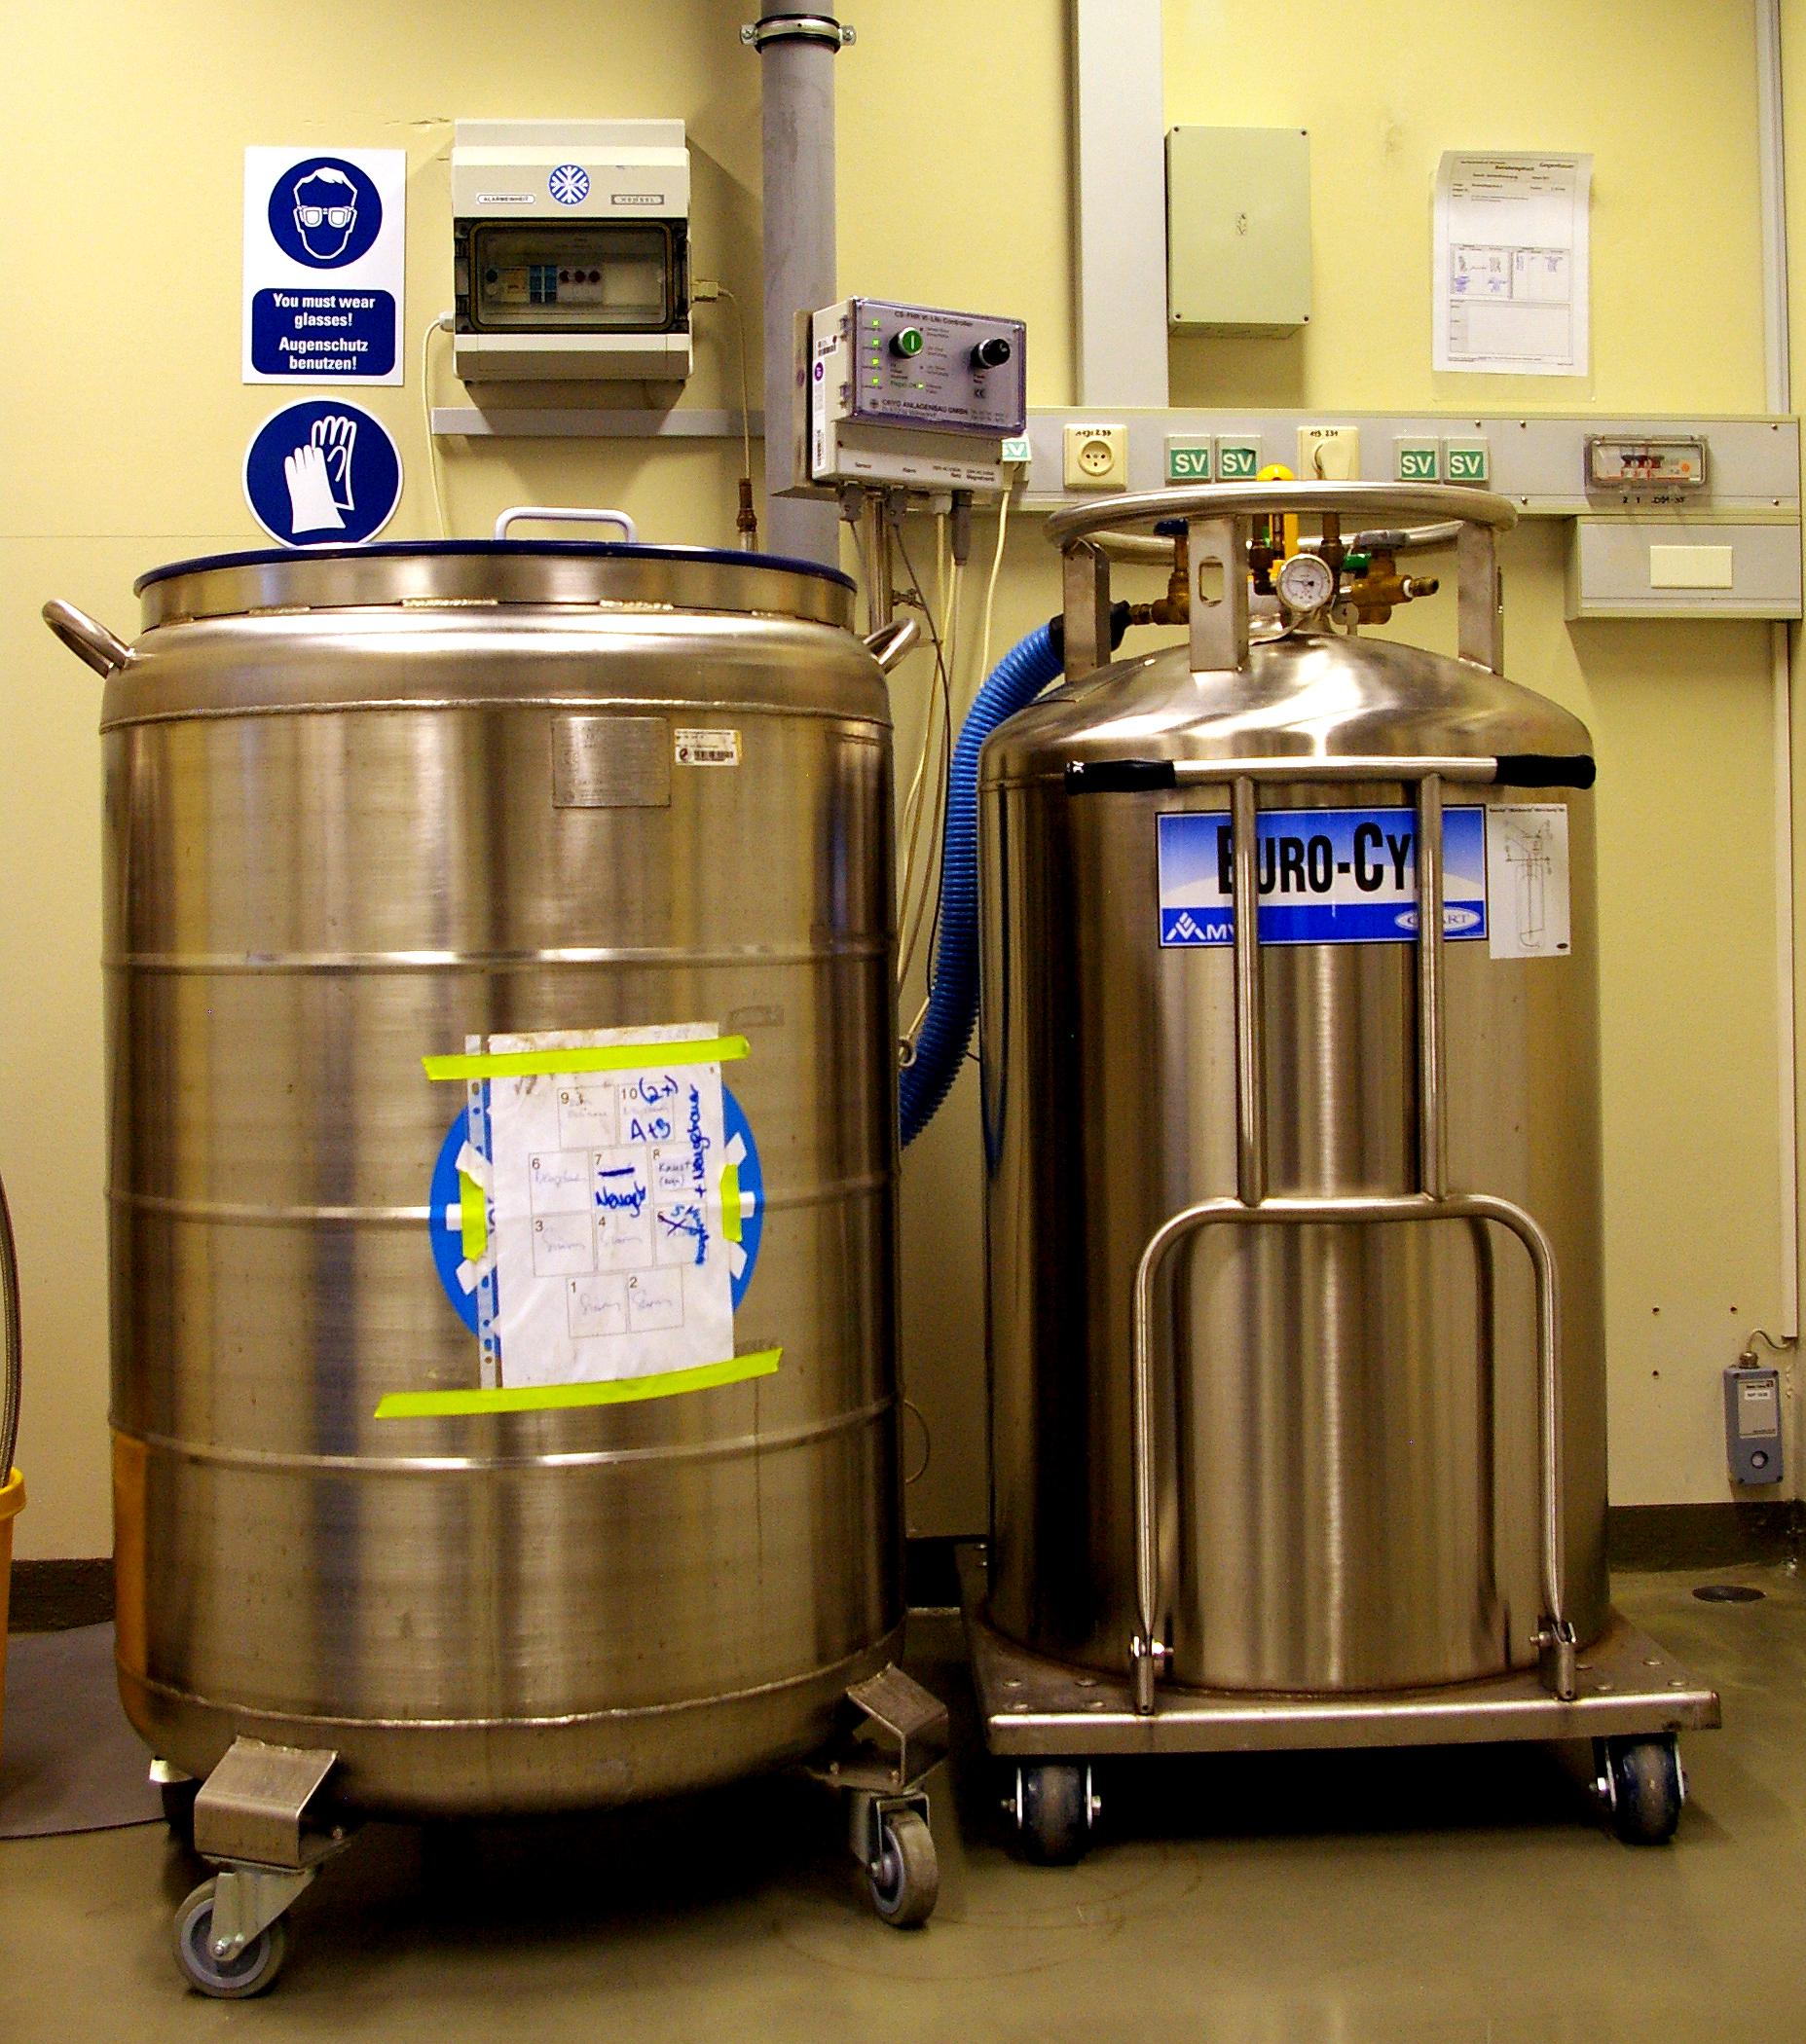 File Liquid Nitrogen Tank For Cryostorage 11 Jpg